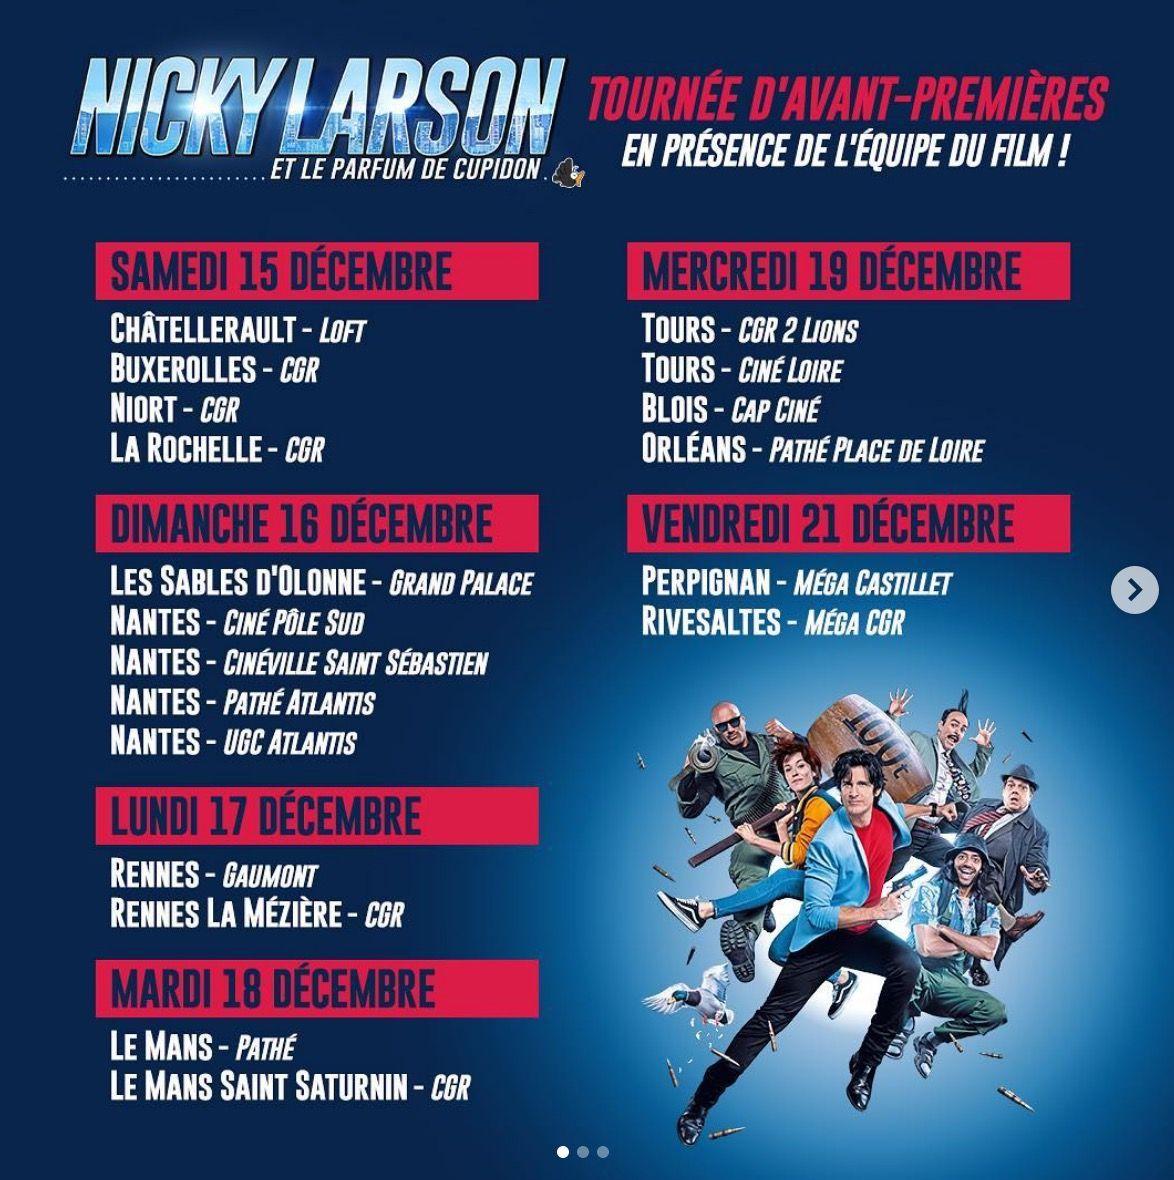 nicky-larson-live-avant-premieres.jpg